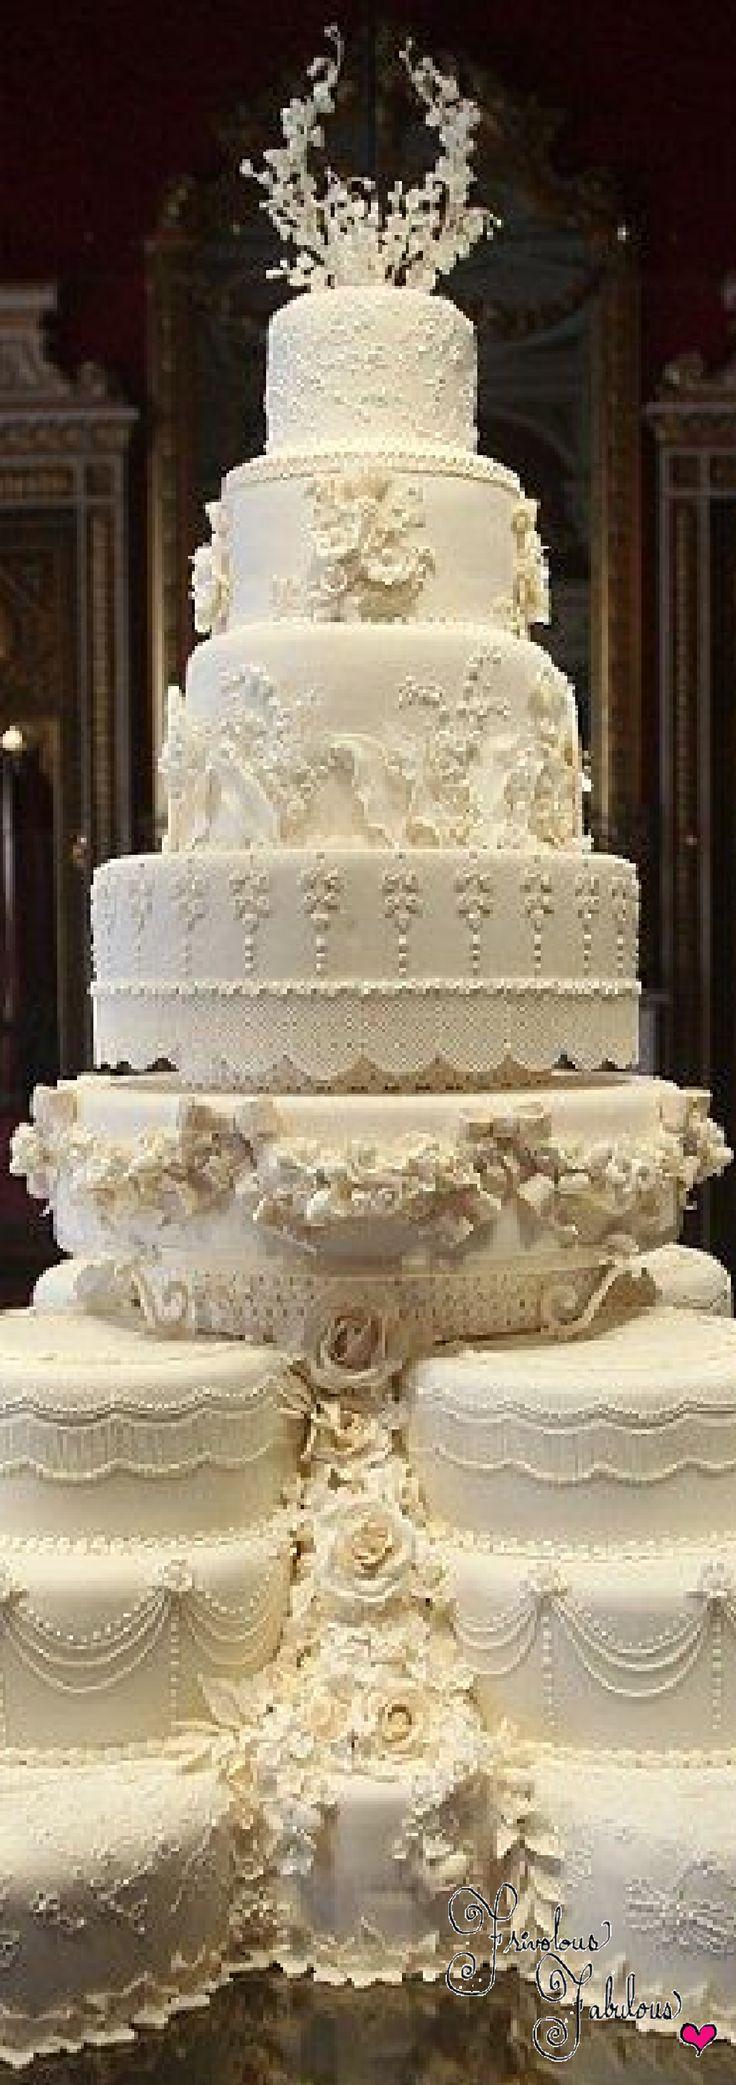 Frivolous Fabulous - Royal Wedding Cakes Frivolous Fabulous Trousseau